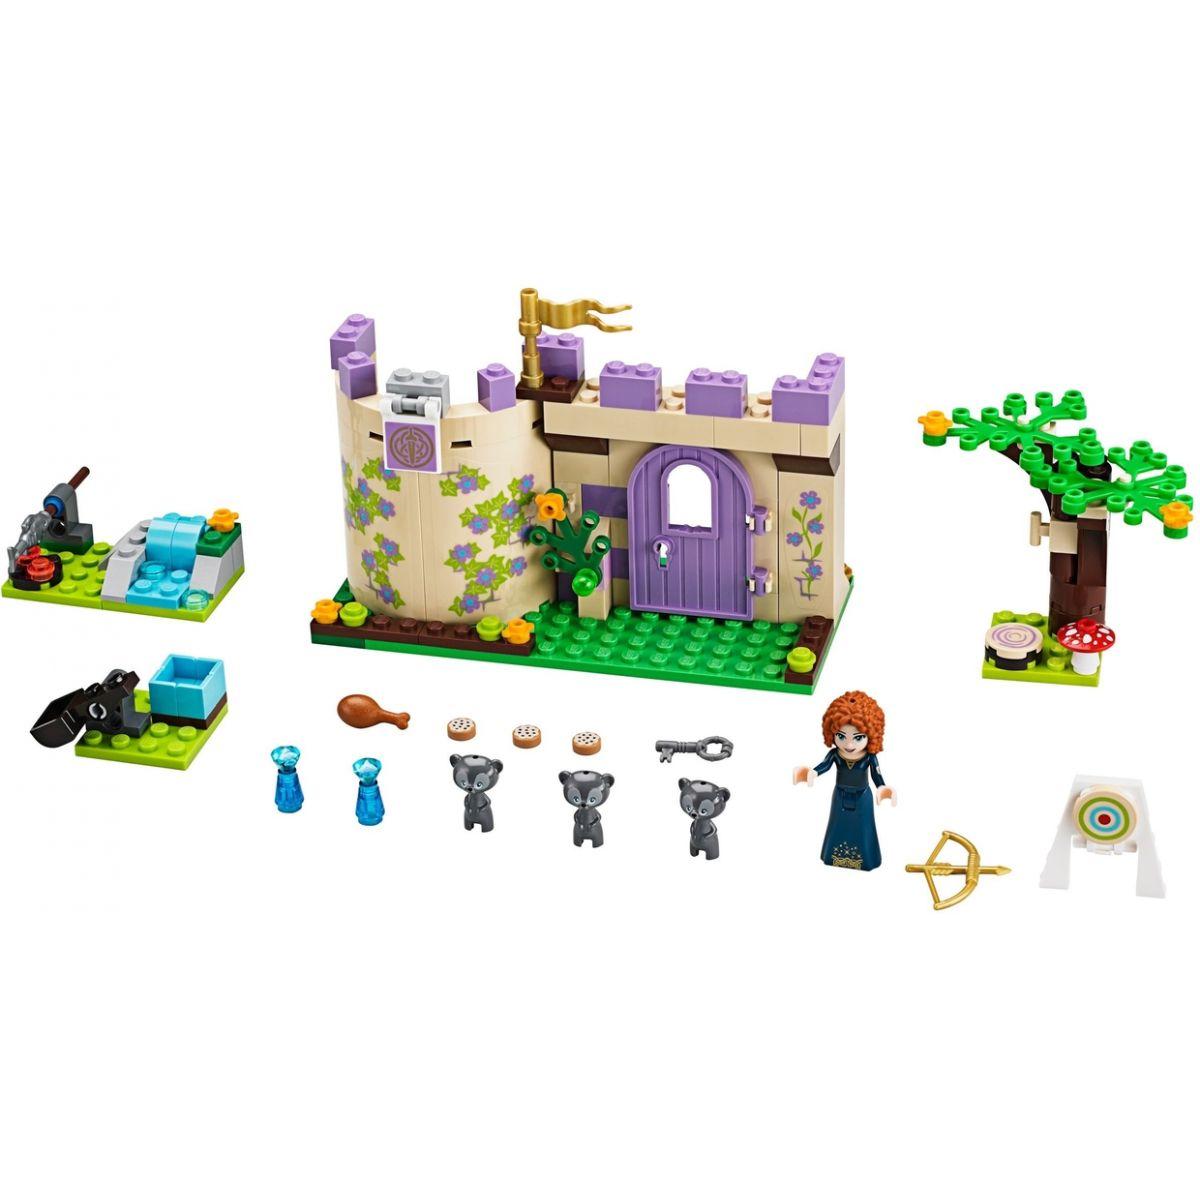 LEGO Disney Princess 41051 Hry princezny Meridy #2